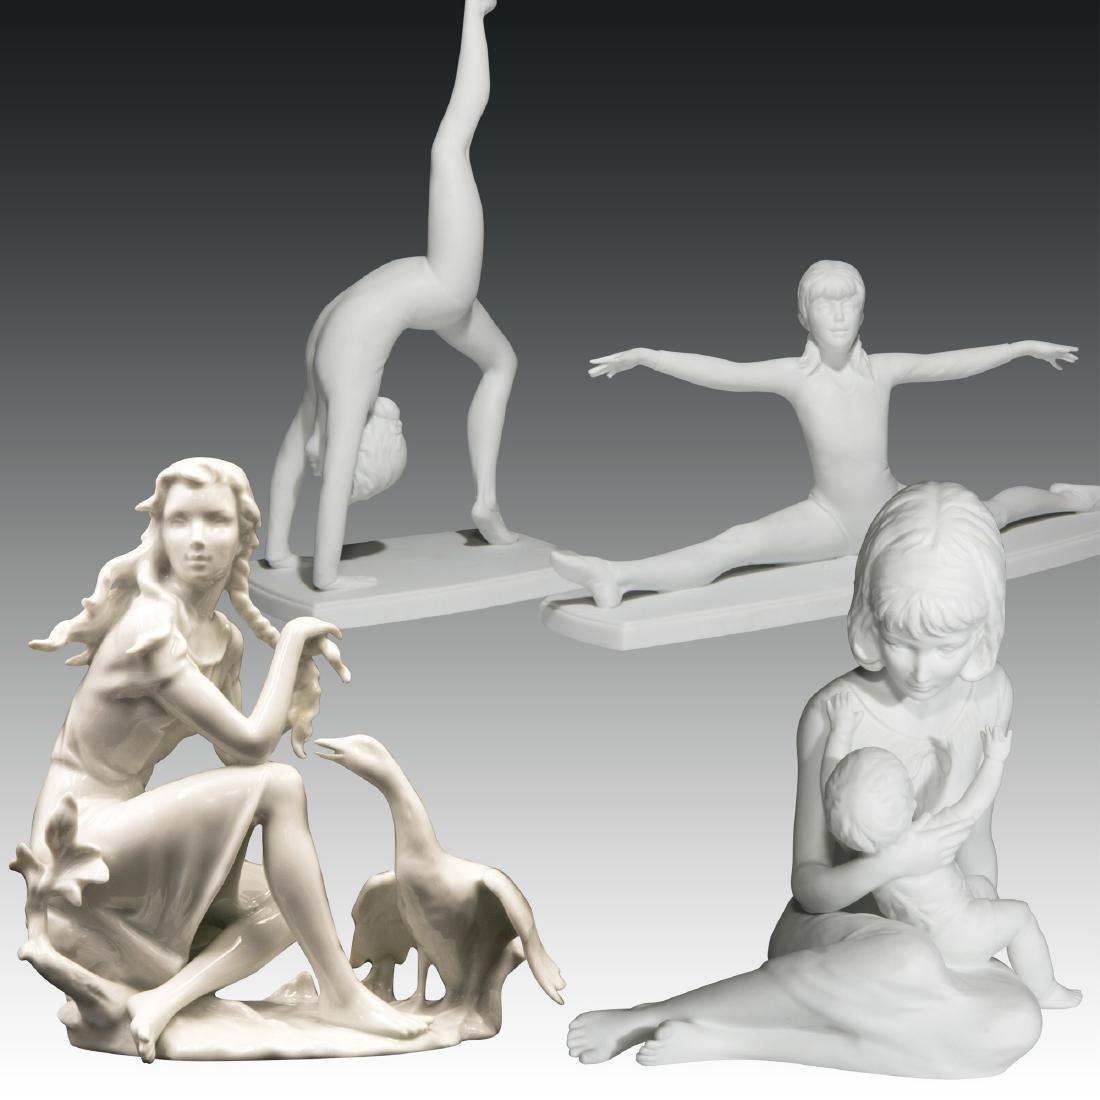 Group of 4 Kaiser & Alka Female Figurines